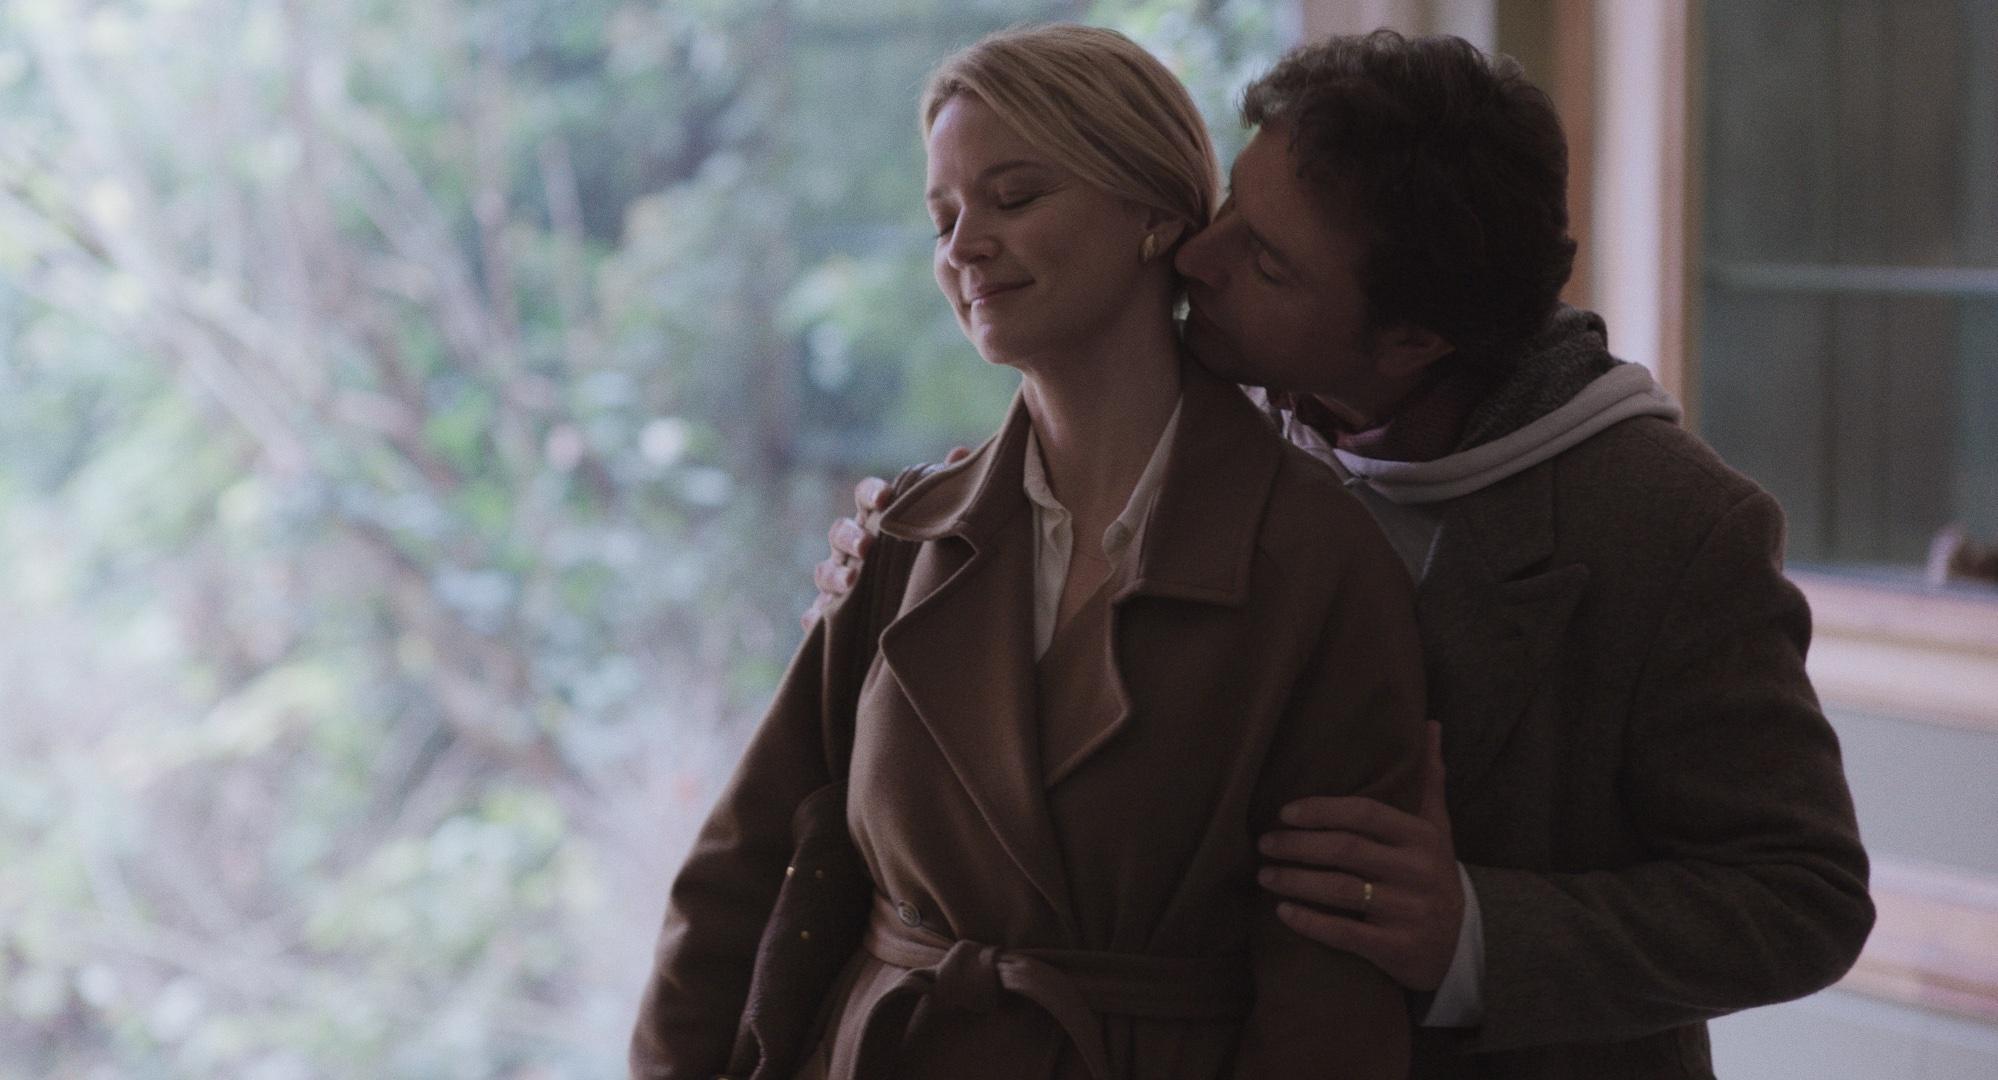 Madeleine Collins recensione film di Antoine Barraud con Virginie Efira